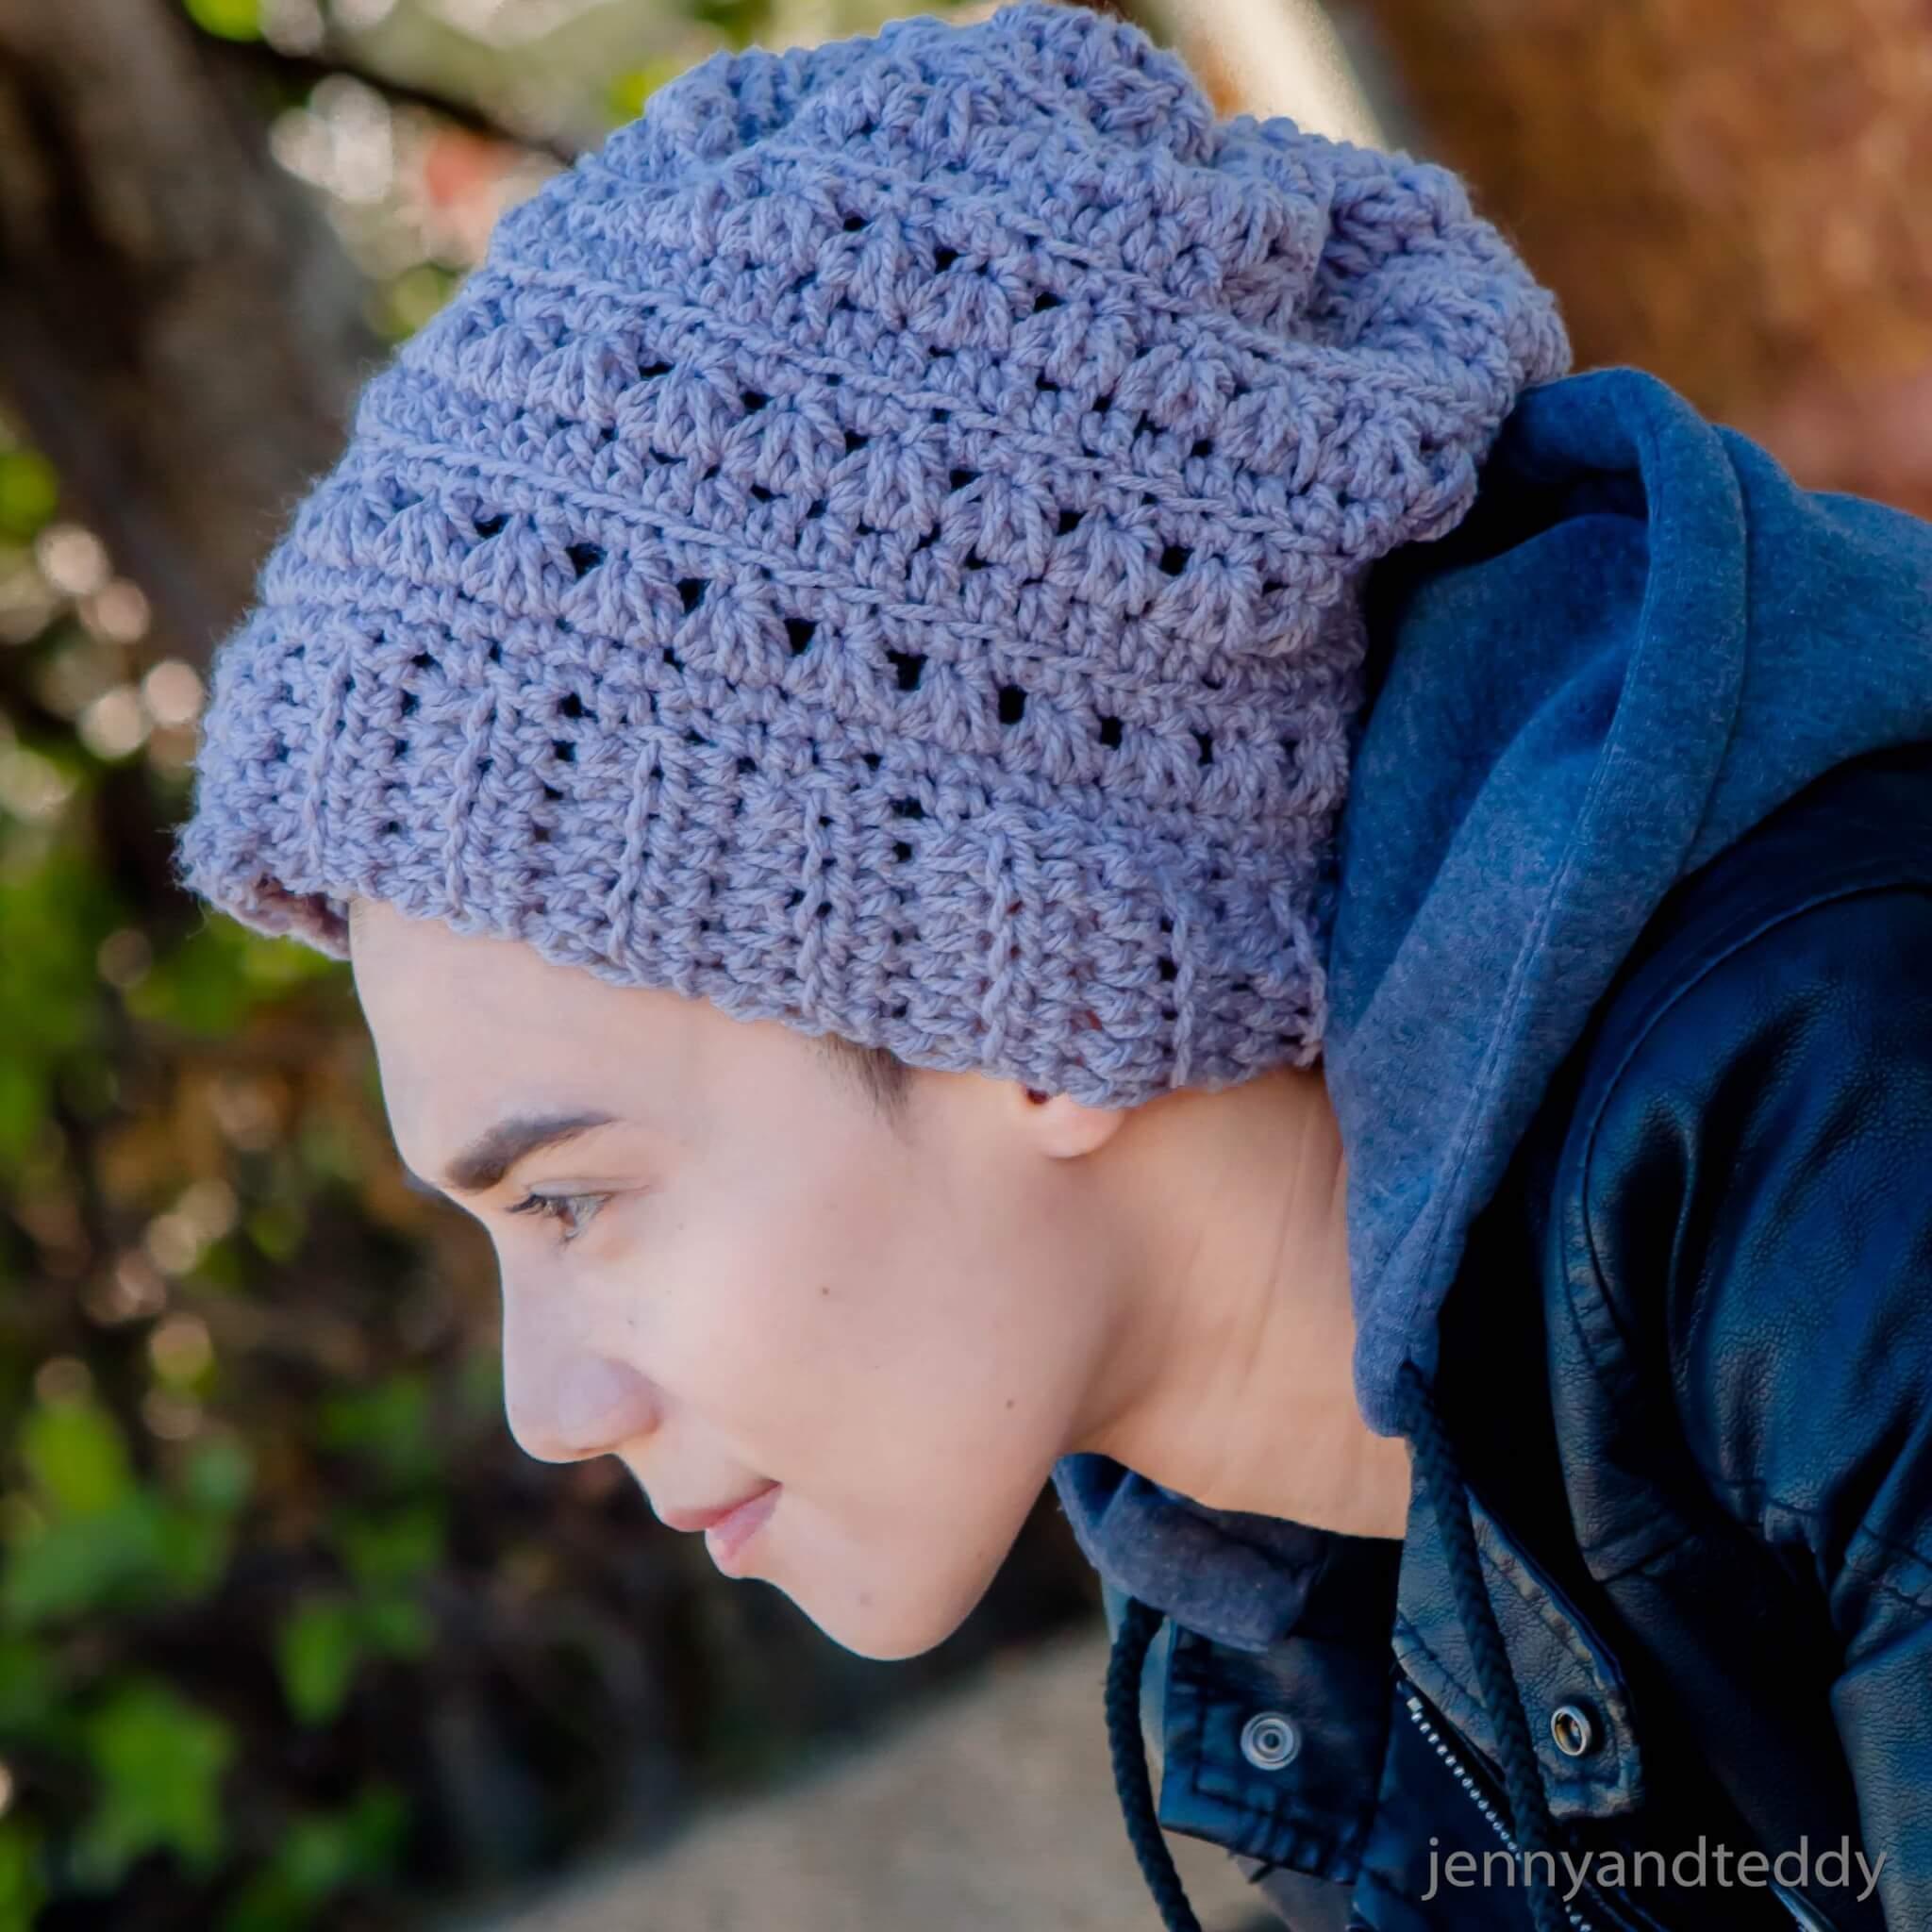 Crochet Beanies For Men The Newman Beanie Hat Free Crochet Pattern